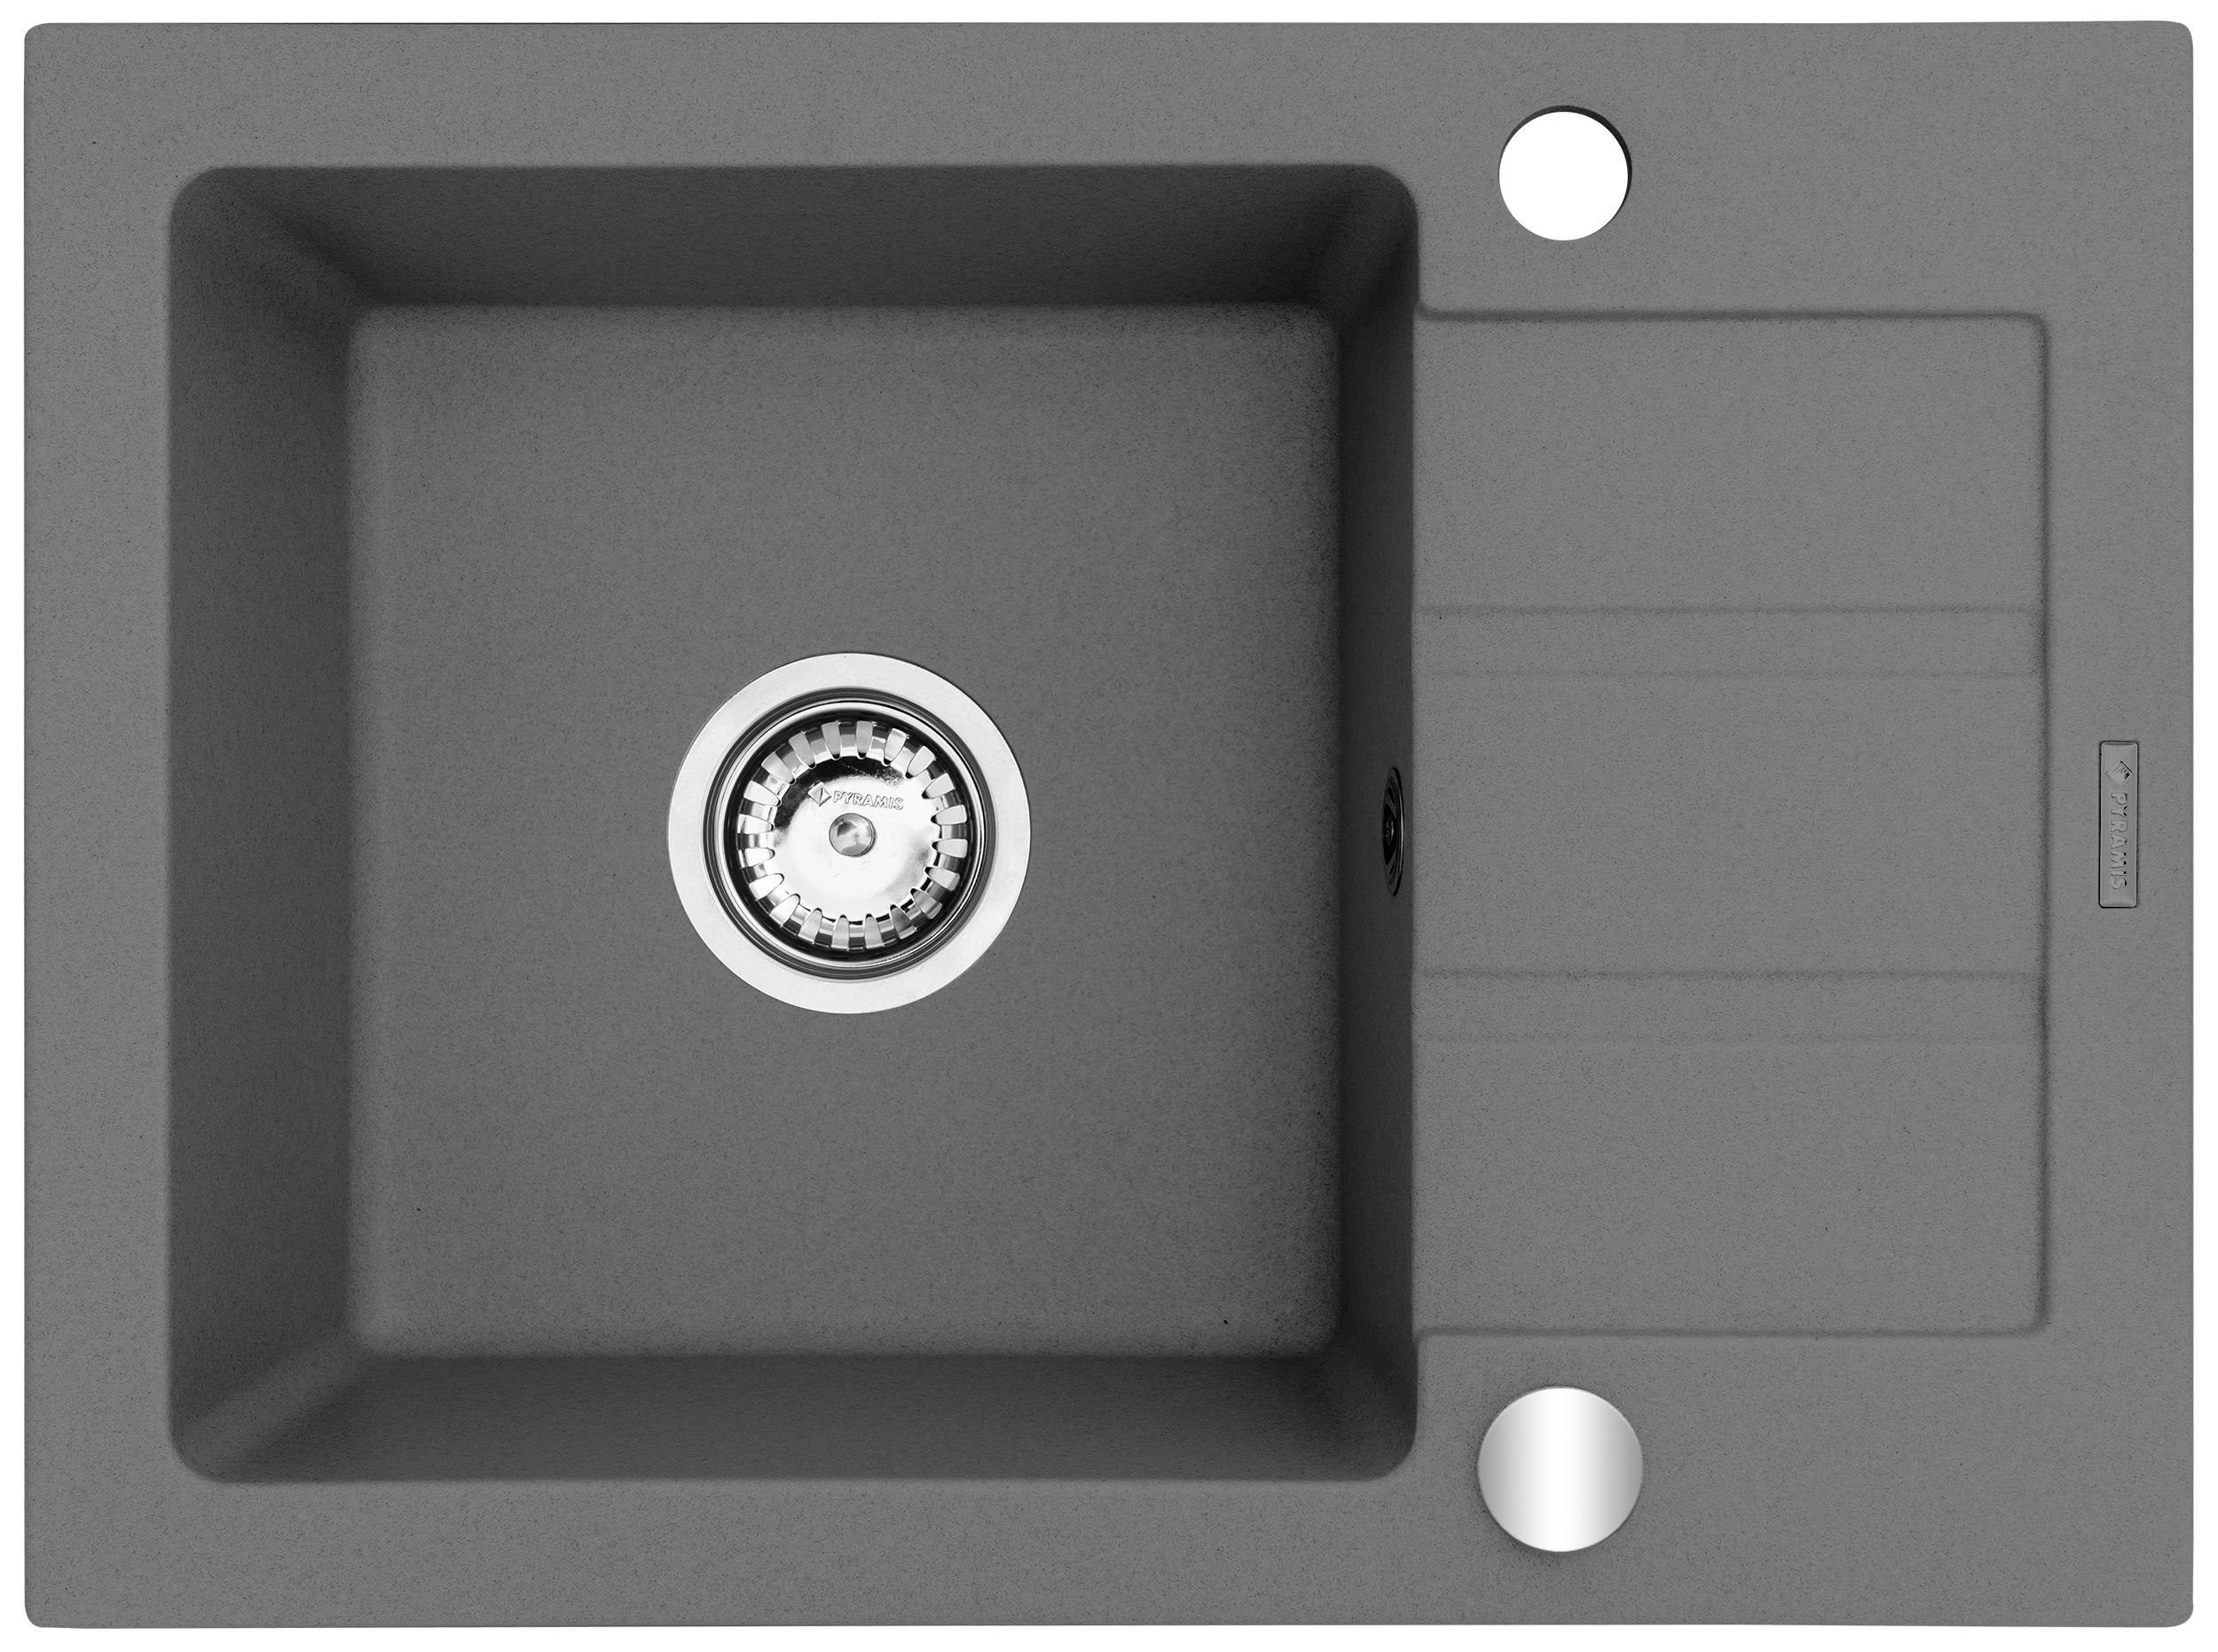 Maidsinks Single bowl sink with draining board Maidsinks Promo 59x44 1B 1D E070054201 gray be (Pyragranit; gray) Izlietne